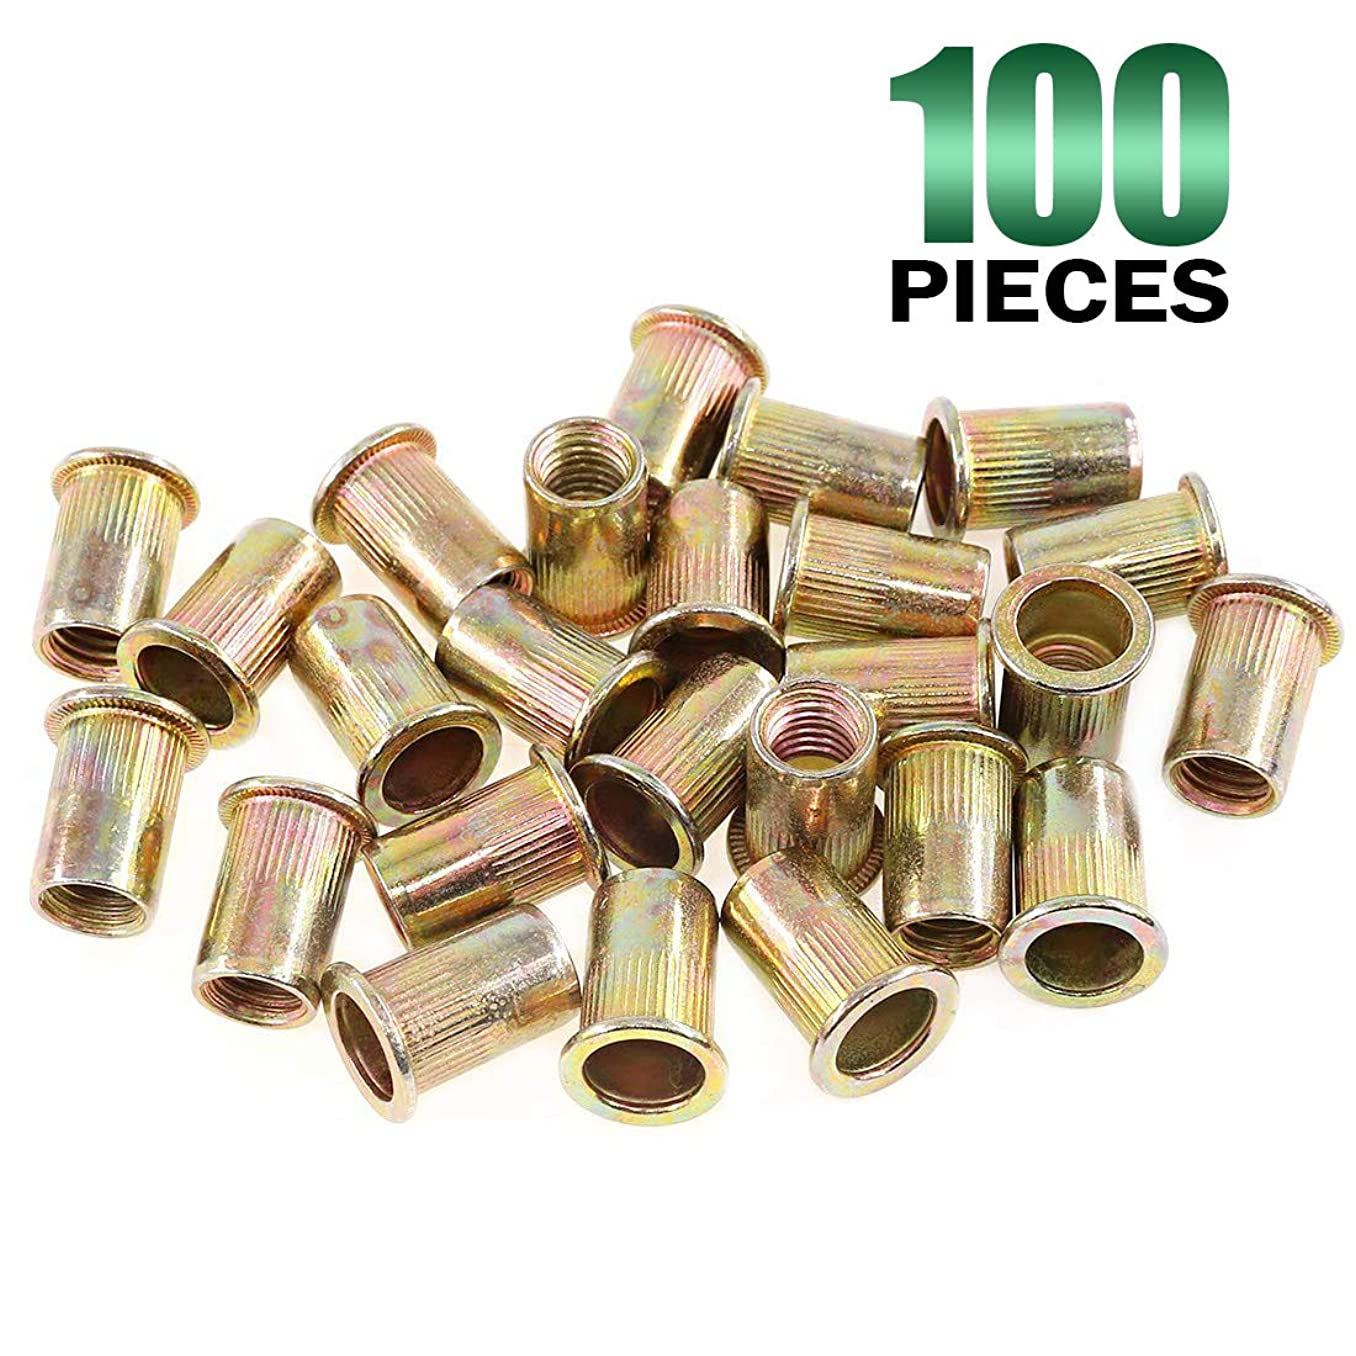 Keadic 100Pcs Metric Zinc Plated Carbon Steel Rivet Nut Flat Head Threaded Insert Nutsert Kit (M10)